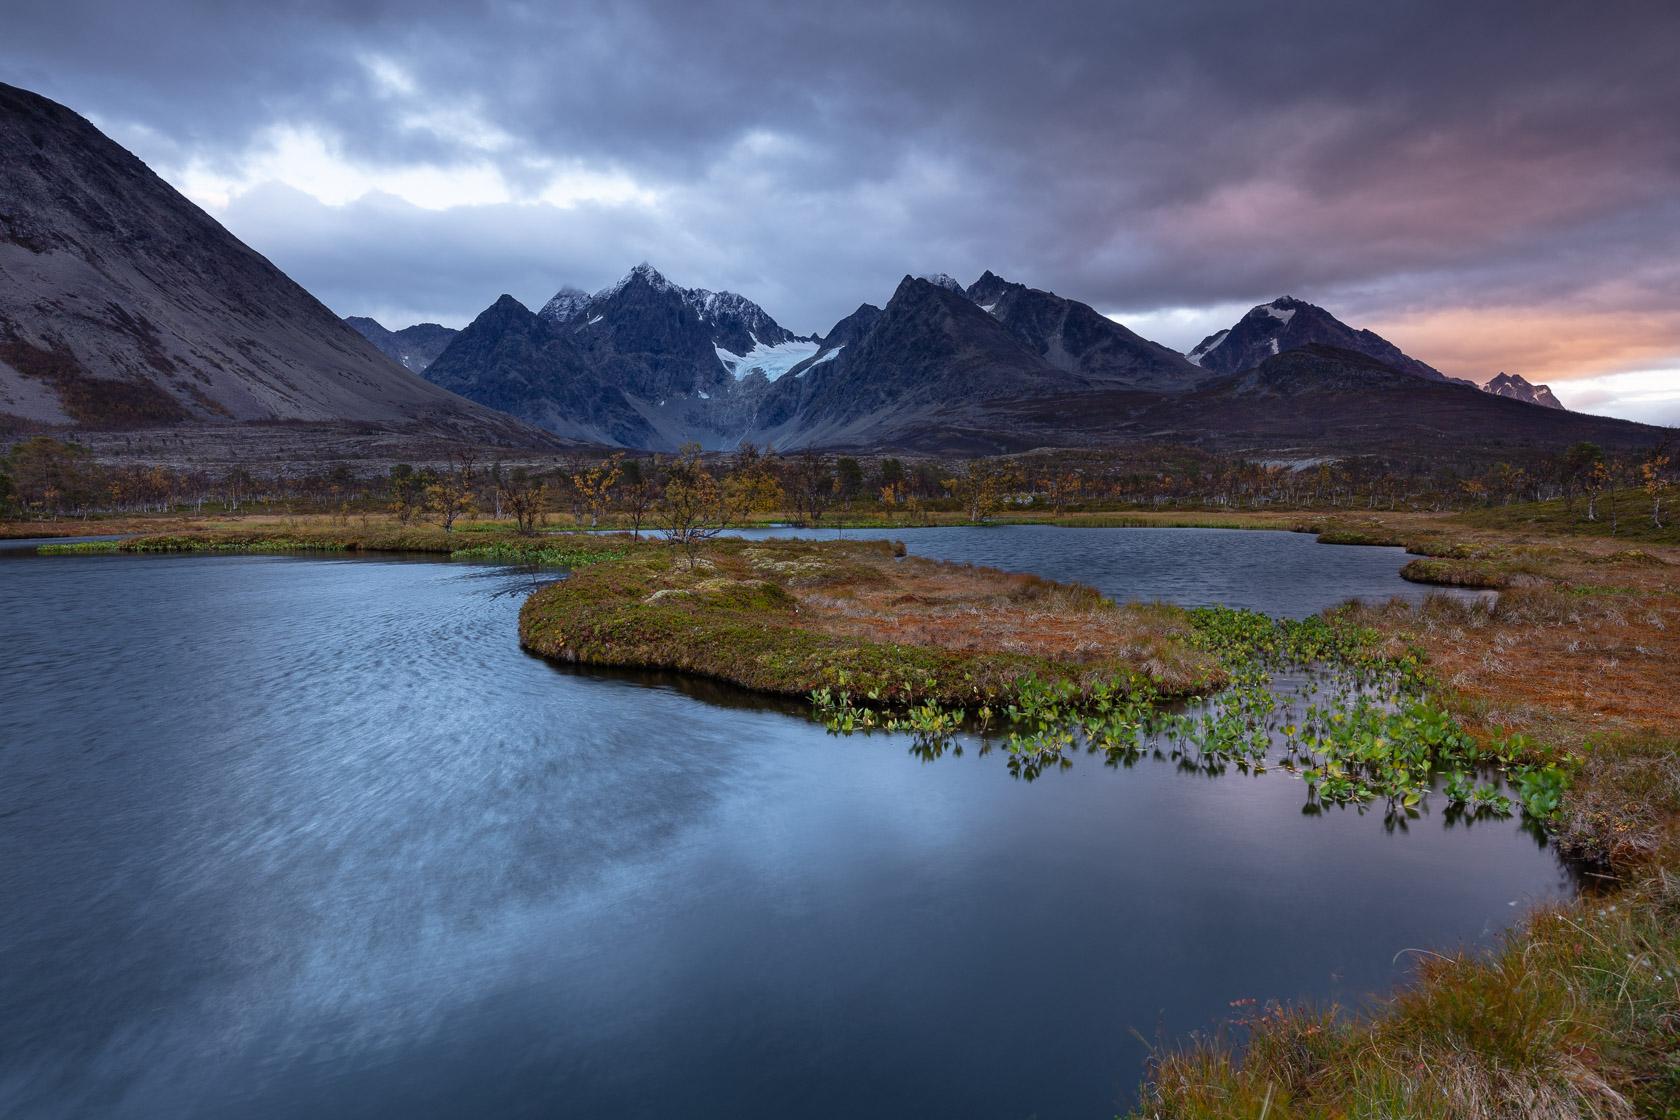 Jægervasstindan et Lenangstindane, dans les Alpes de Lyngen, en Norvège